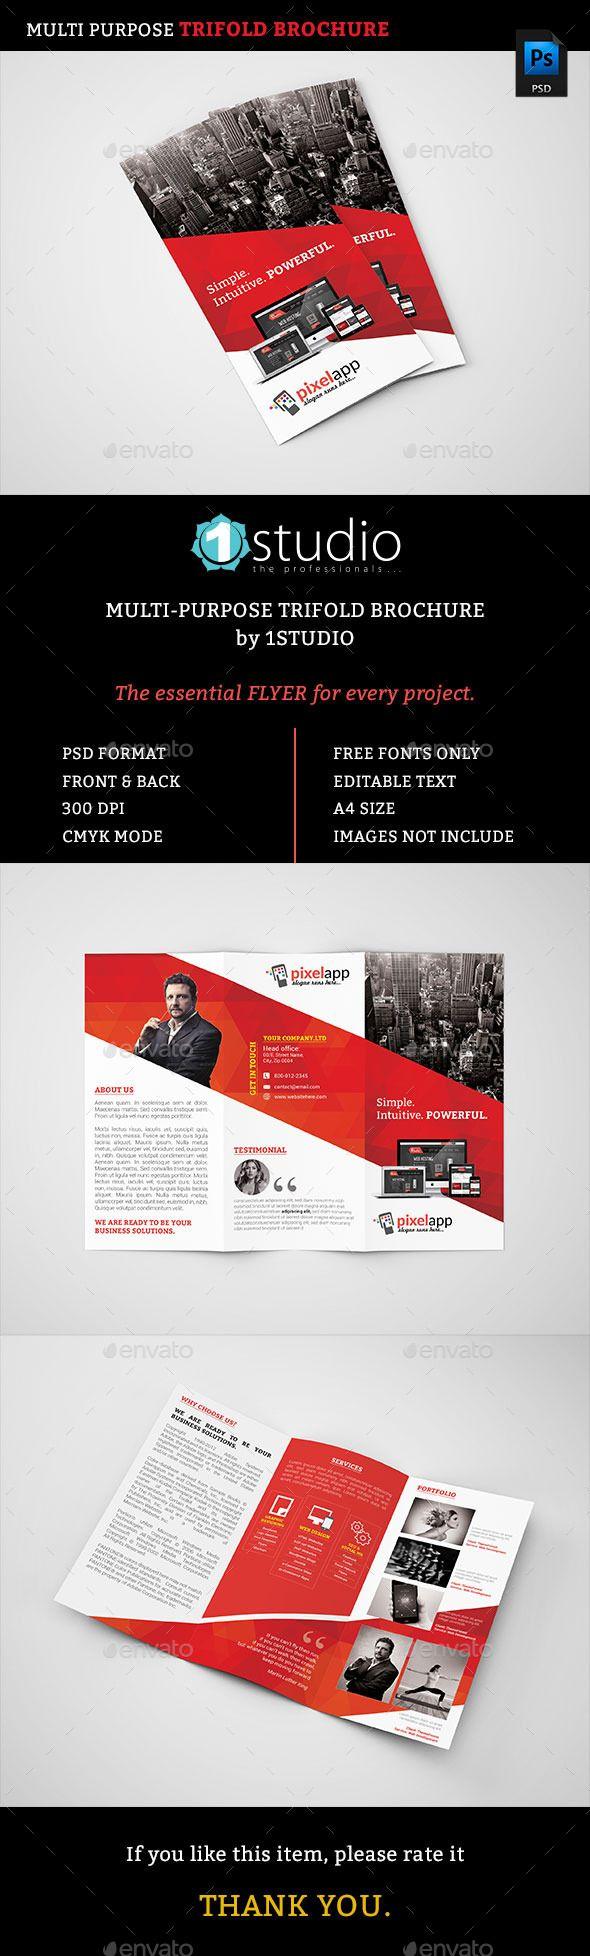 Corporate Trifold Brochure Template #design Download: http://graphicriver.net/item/corporate-trifold-brochure/12739660?ref=ksioks